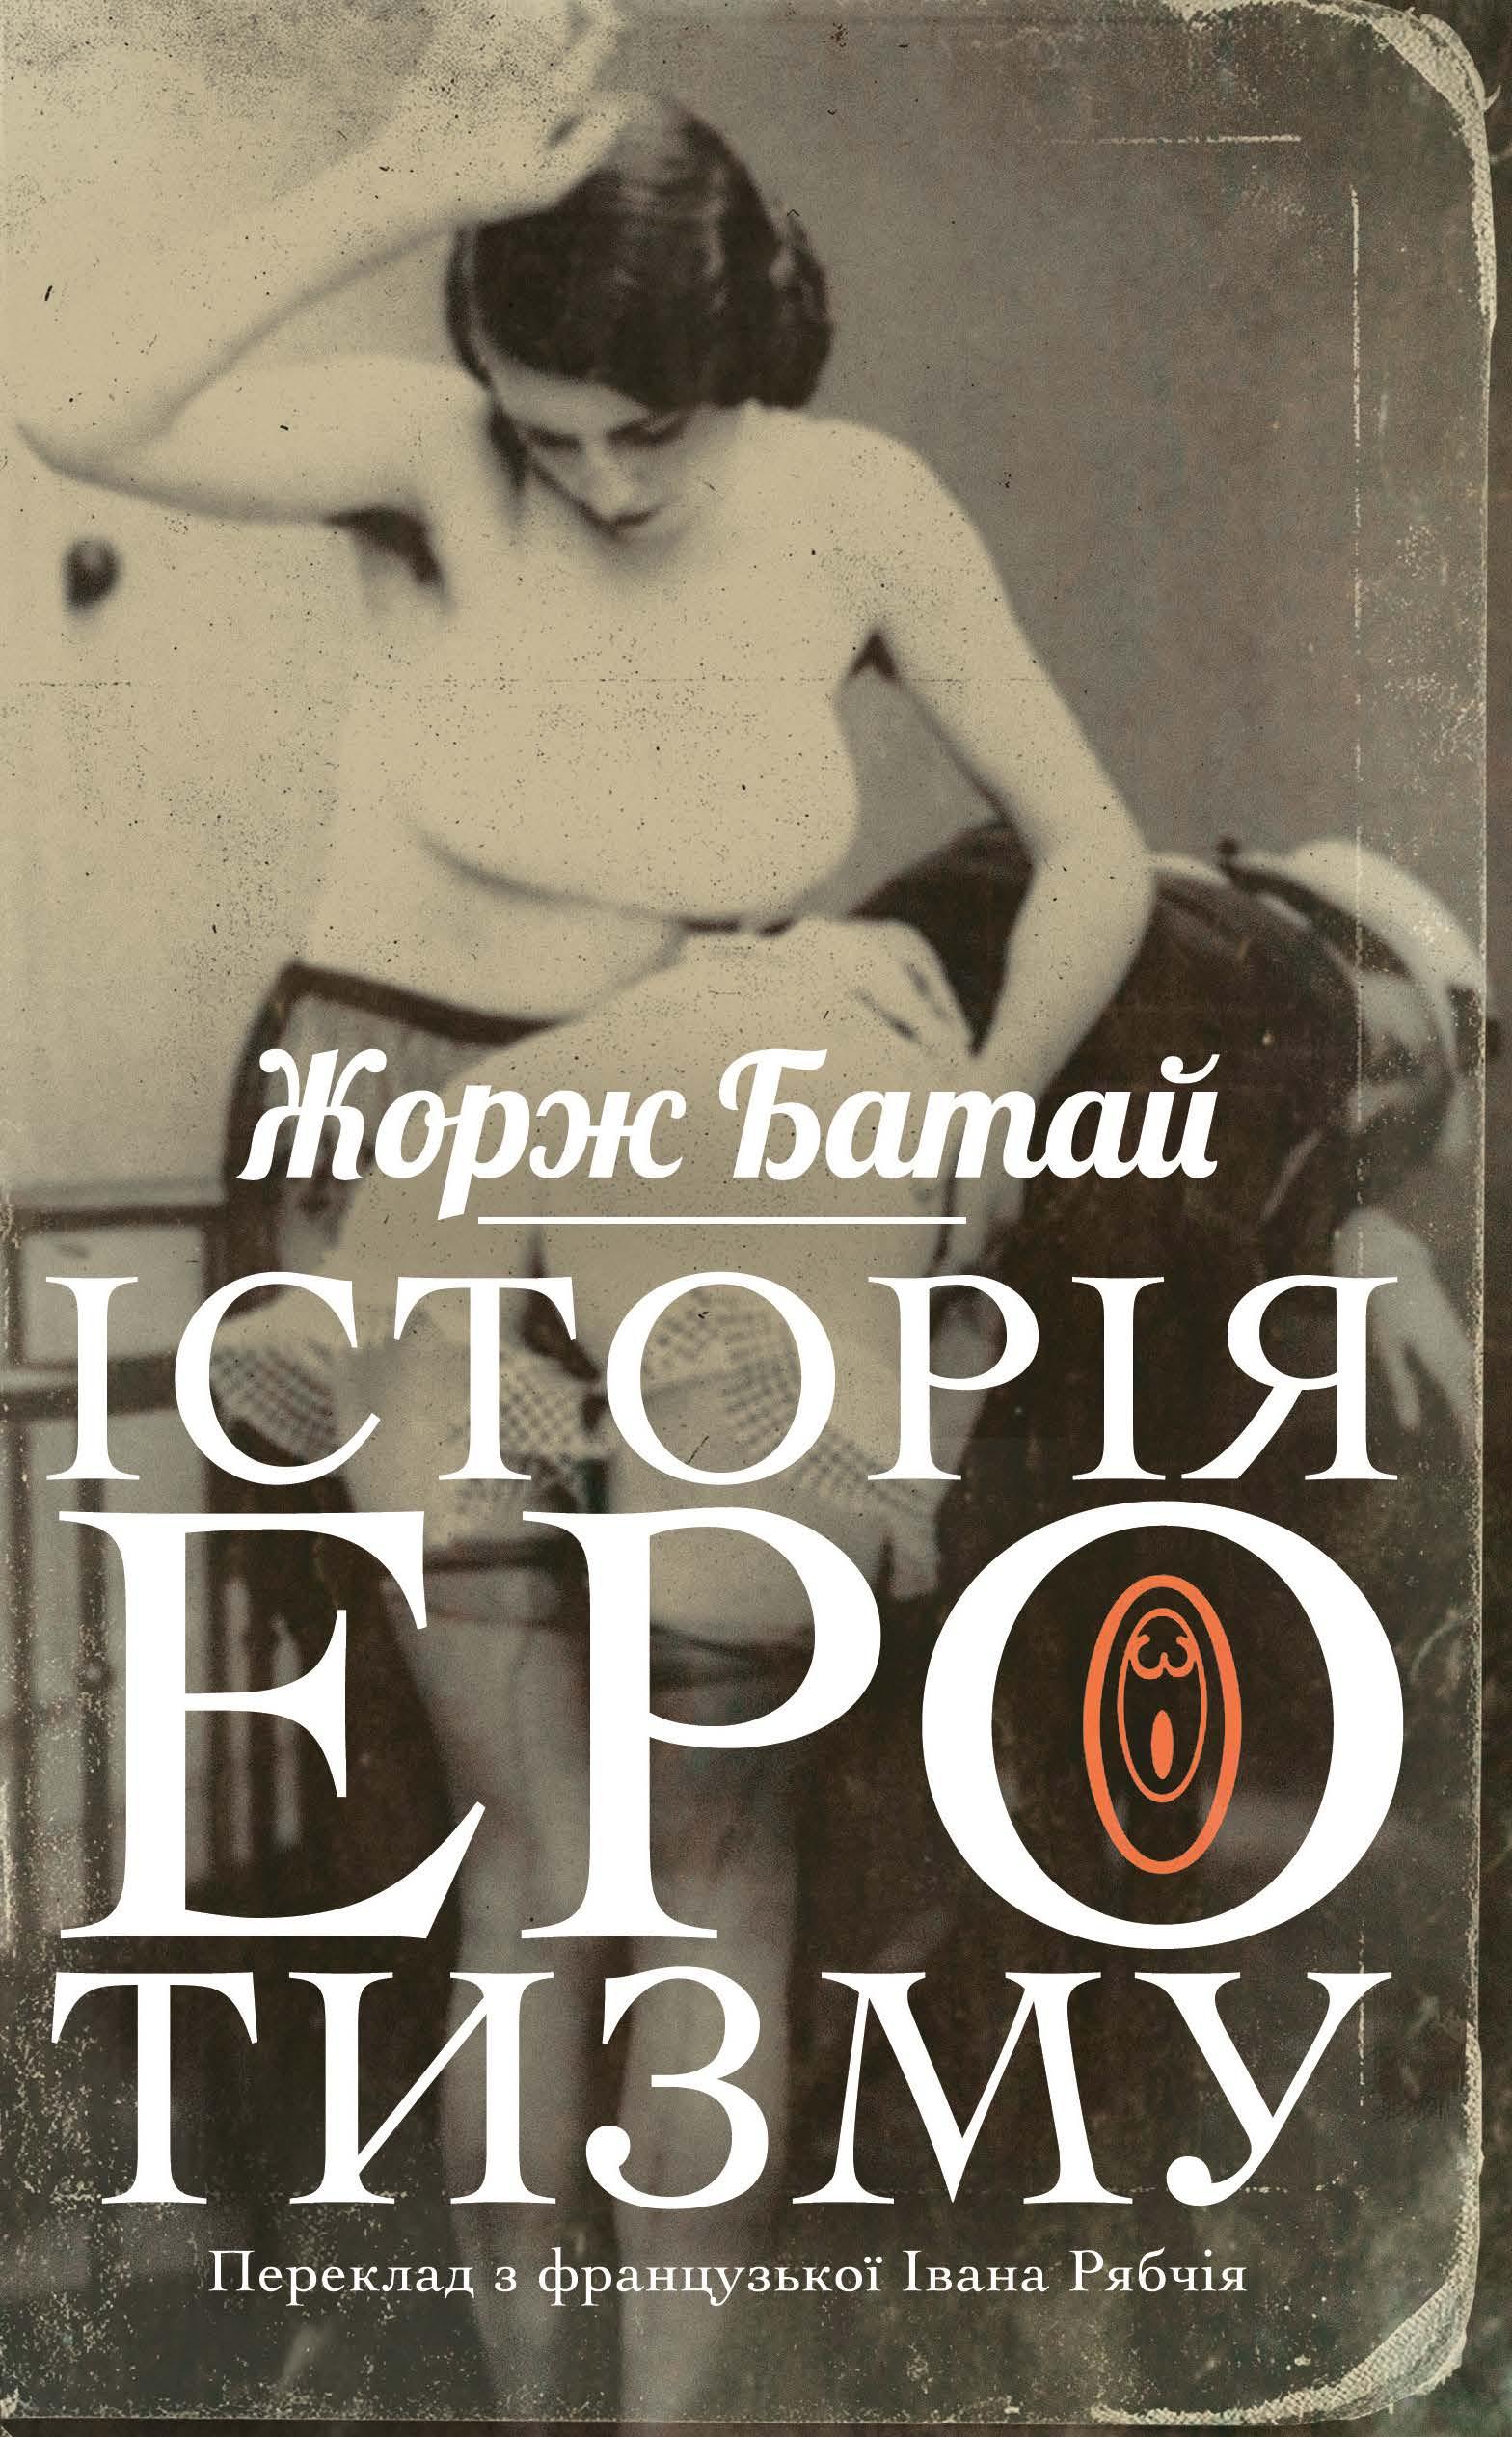 БАТАЙ Жорж Історія еротизму. Есе